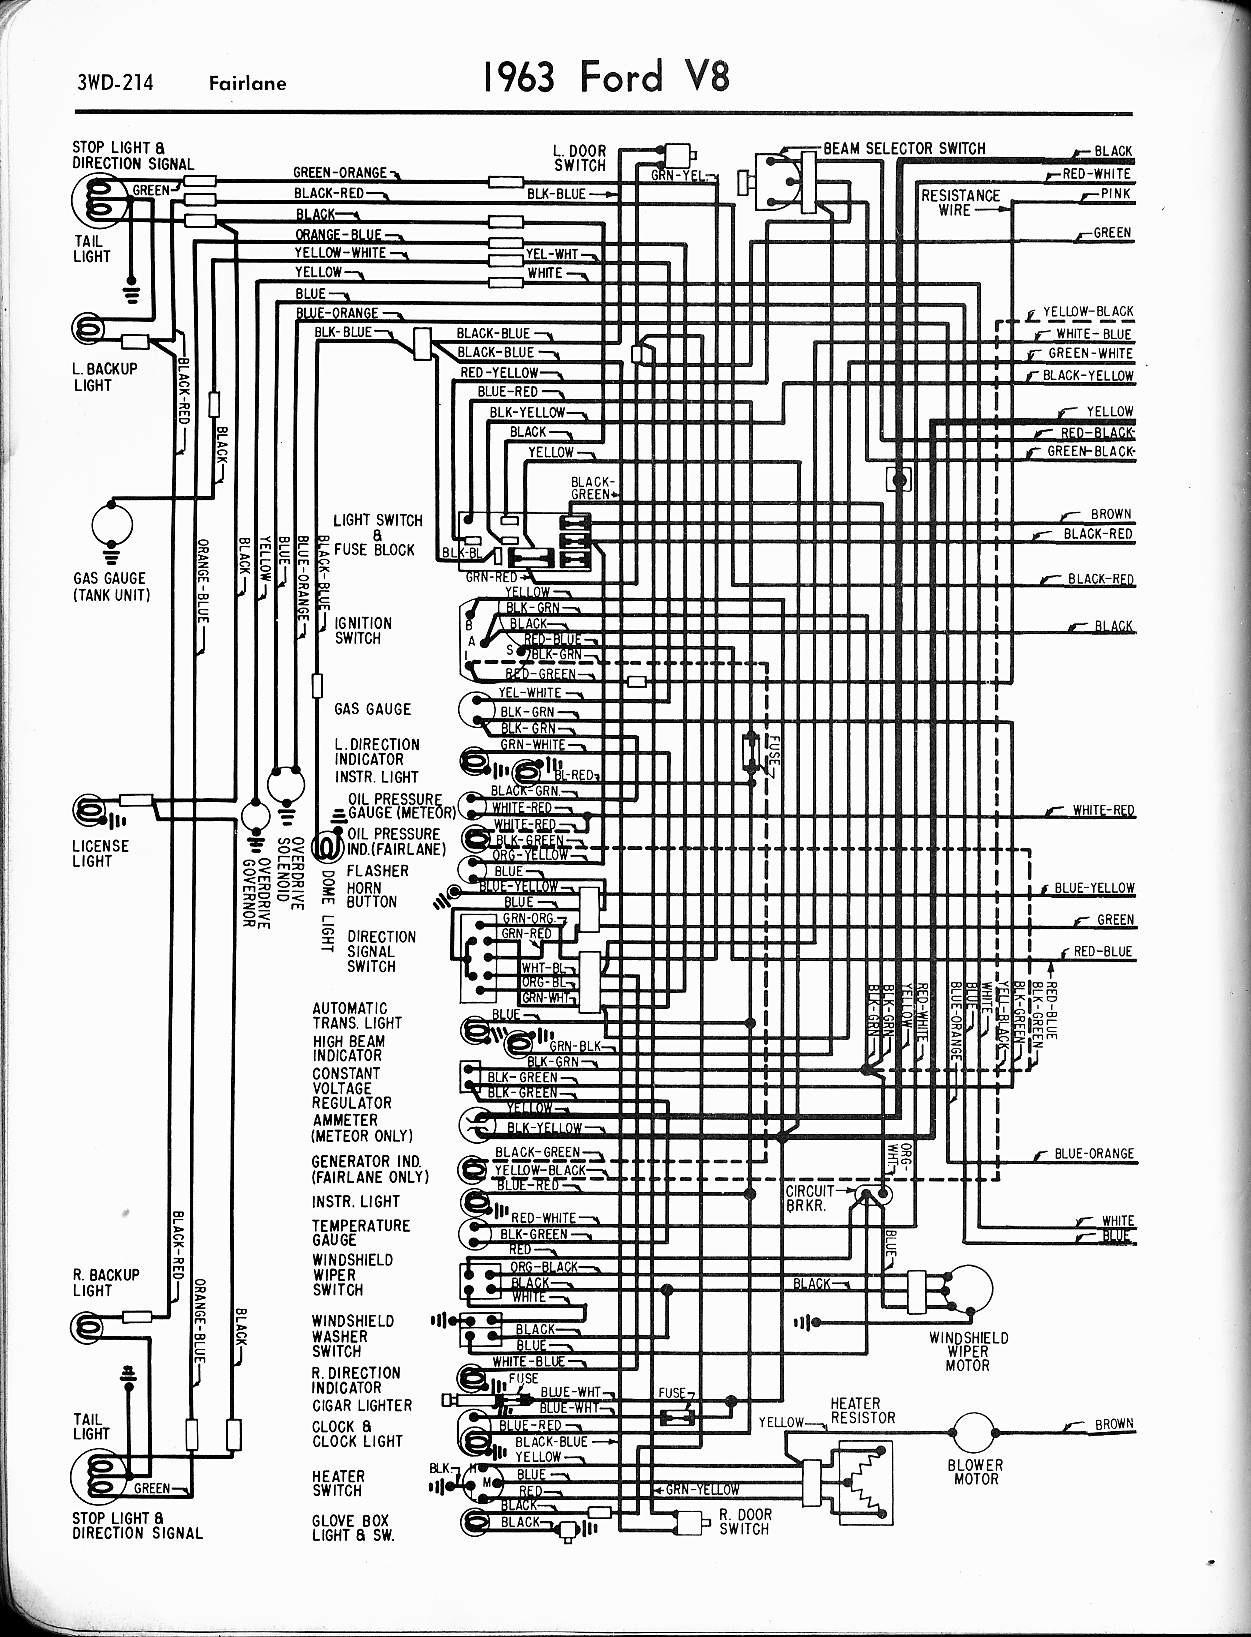 Ford Radio Wiring Harness Diagram 57 65 ford Wiring Diagrams Of Ford Radio Wiring Harness Diagram